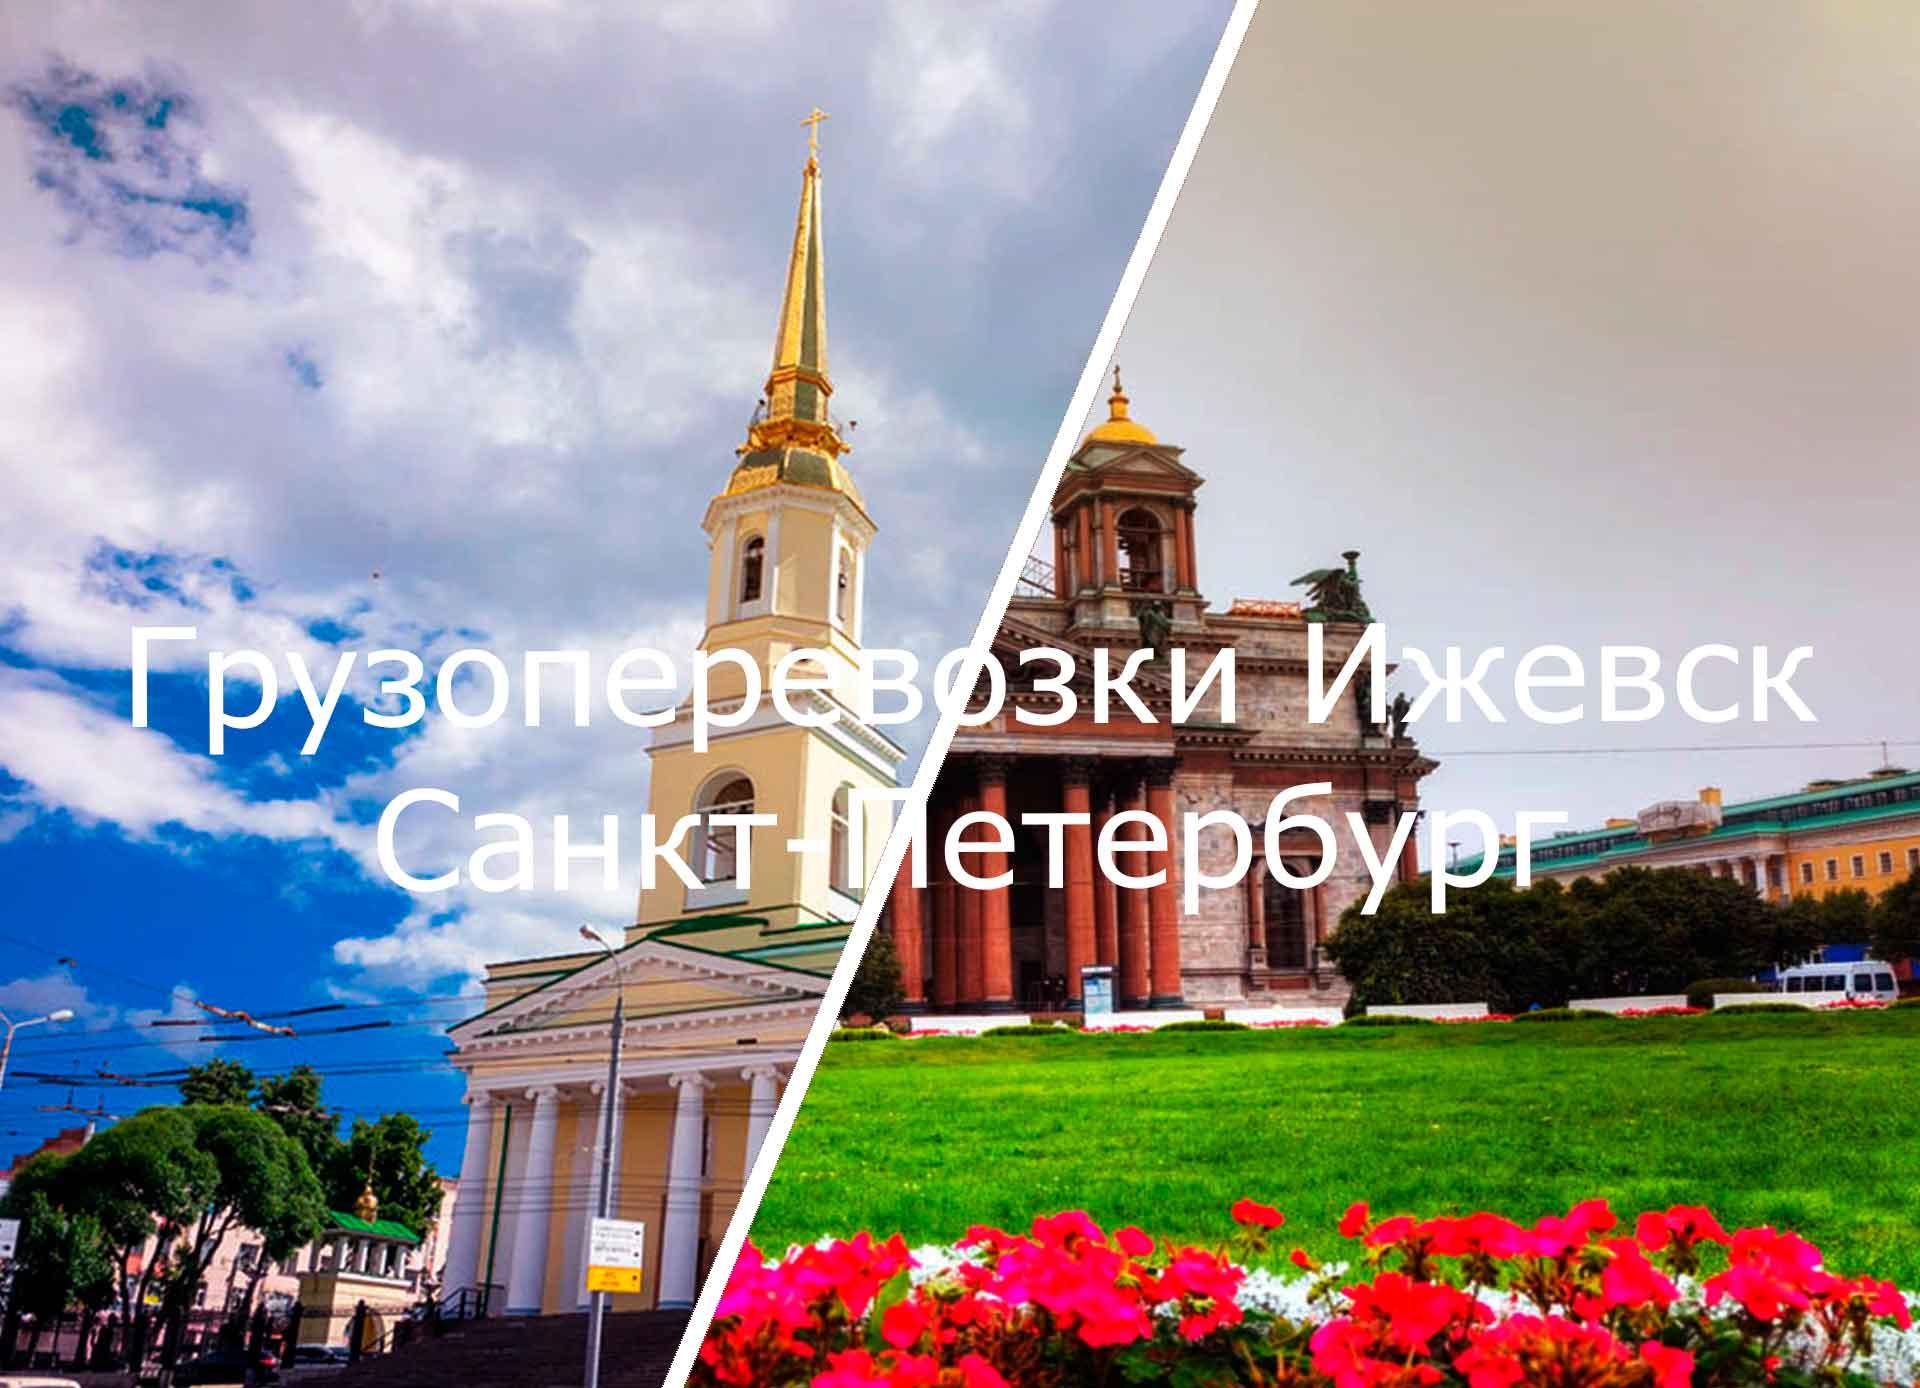 грузоперевозки ижевск санкт петербург